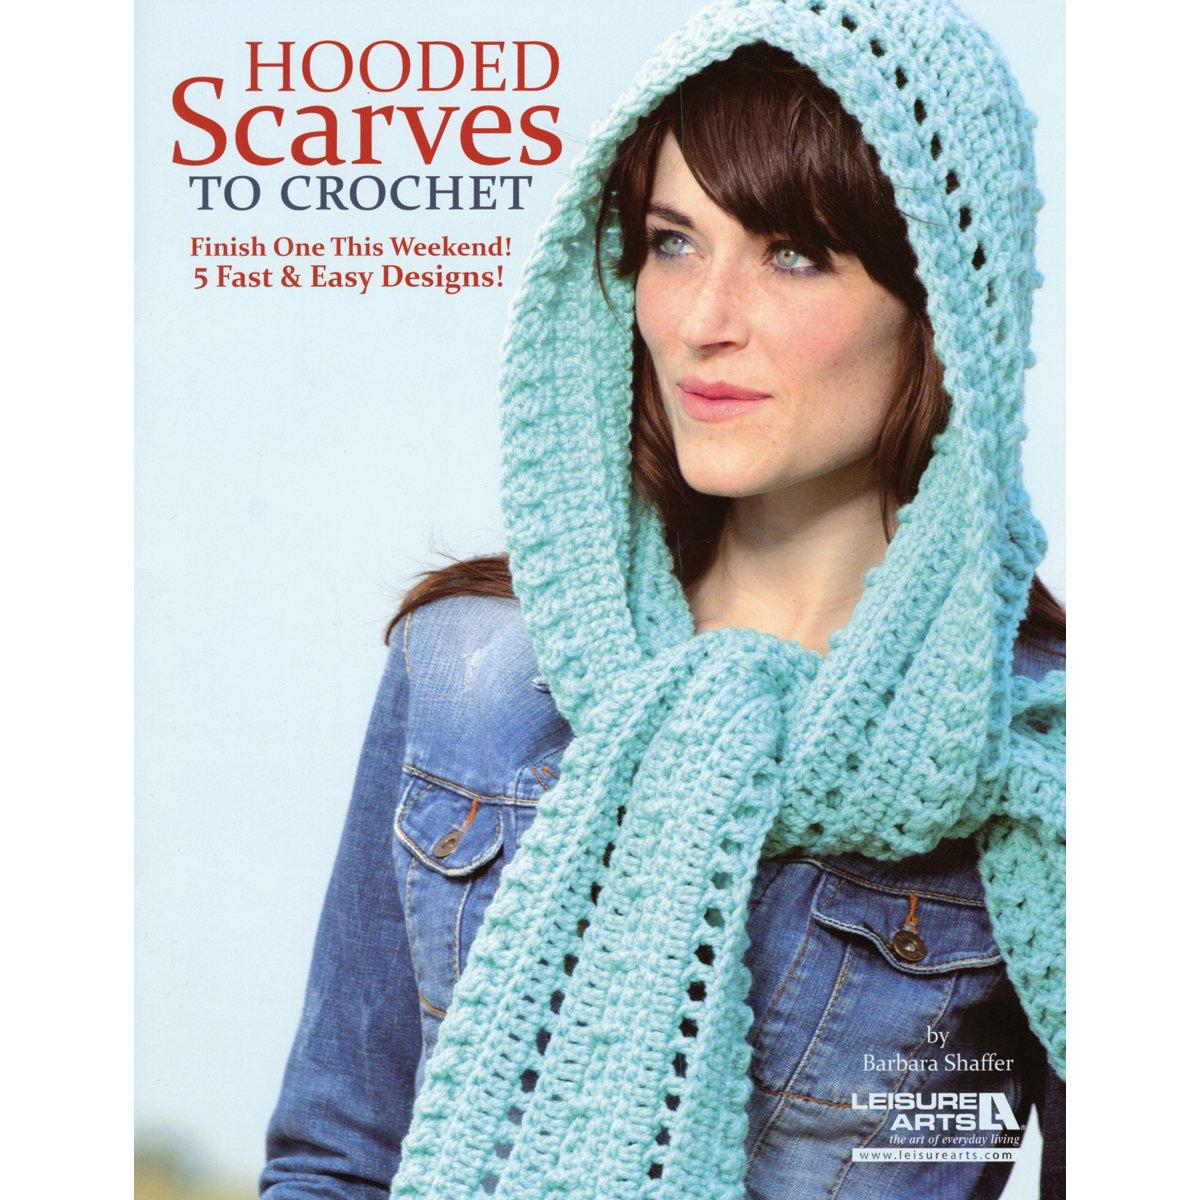 Leisure Arts-Hooded Scarves to Crochet LA-5583